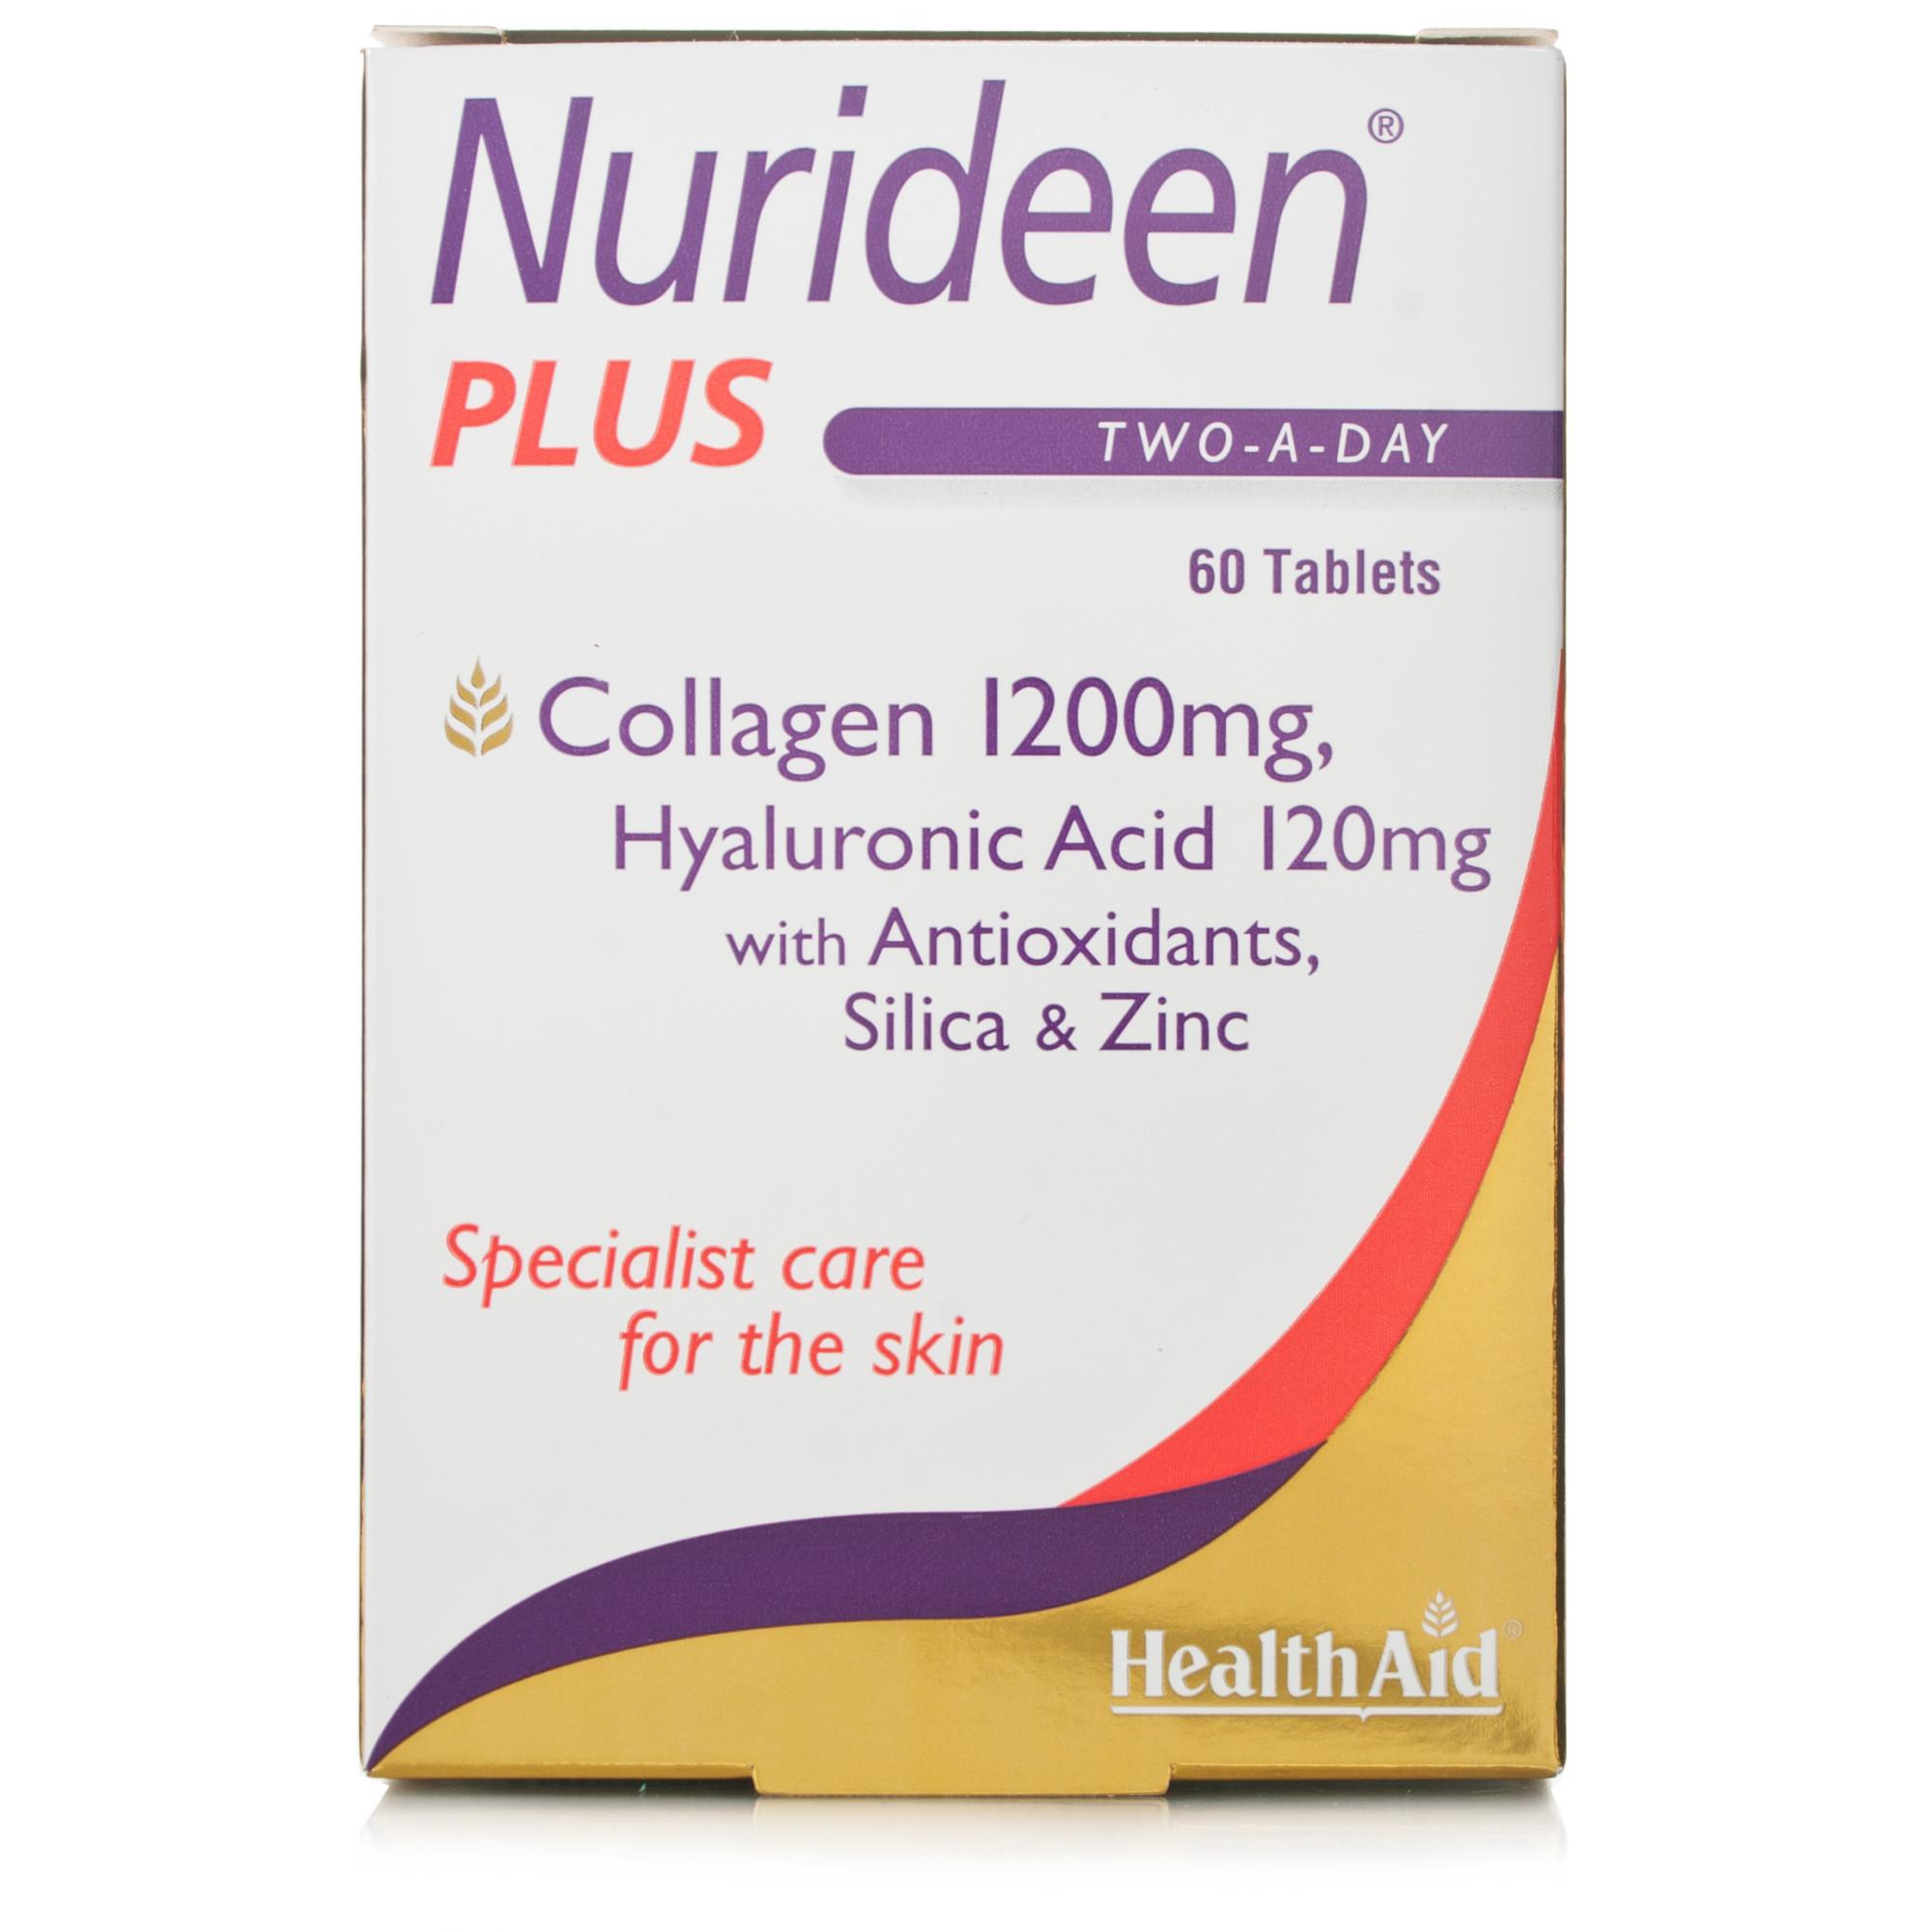 Health Aid Nurideen Plus tablets